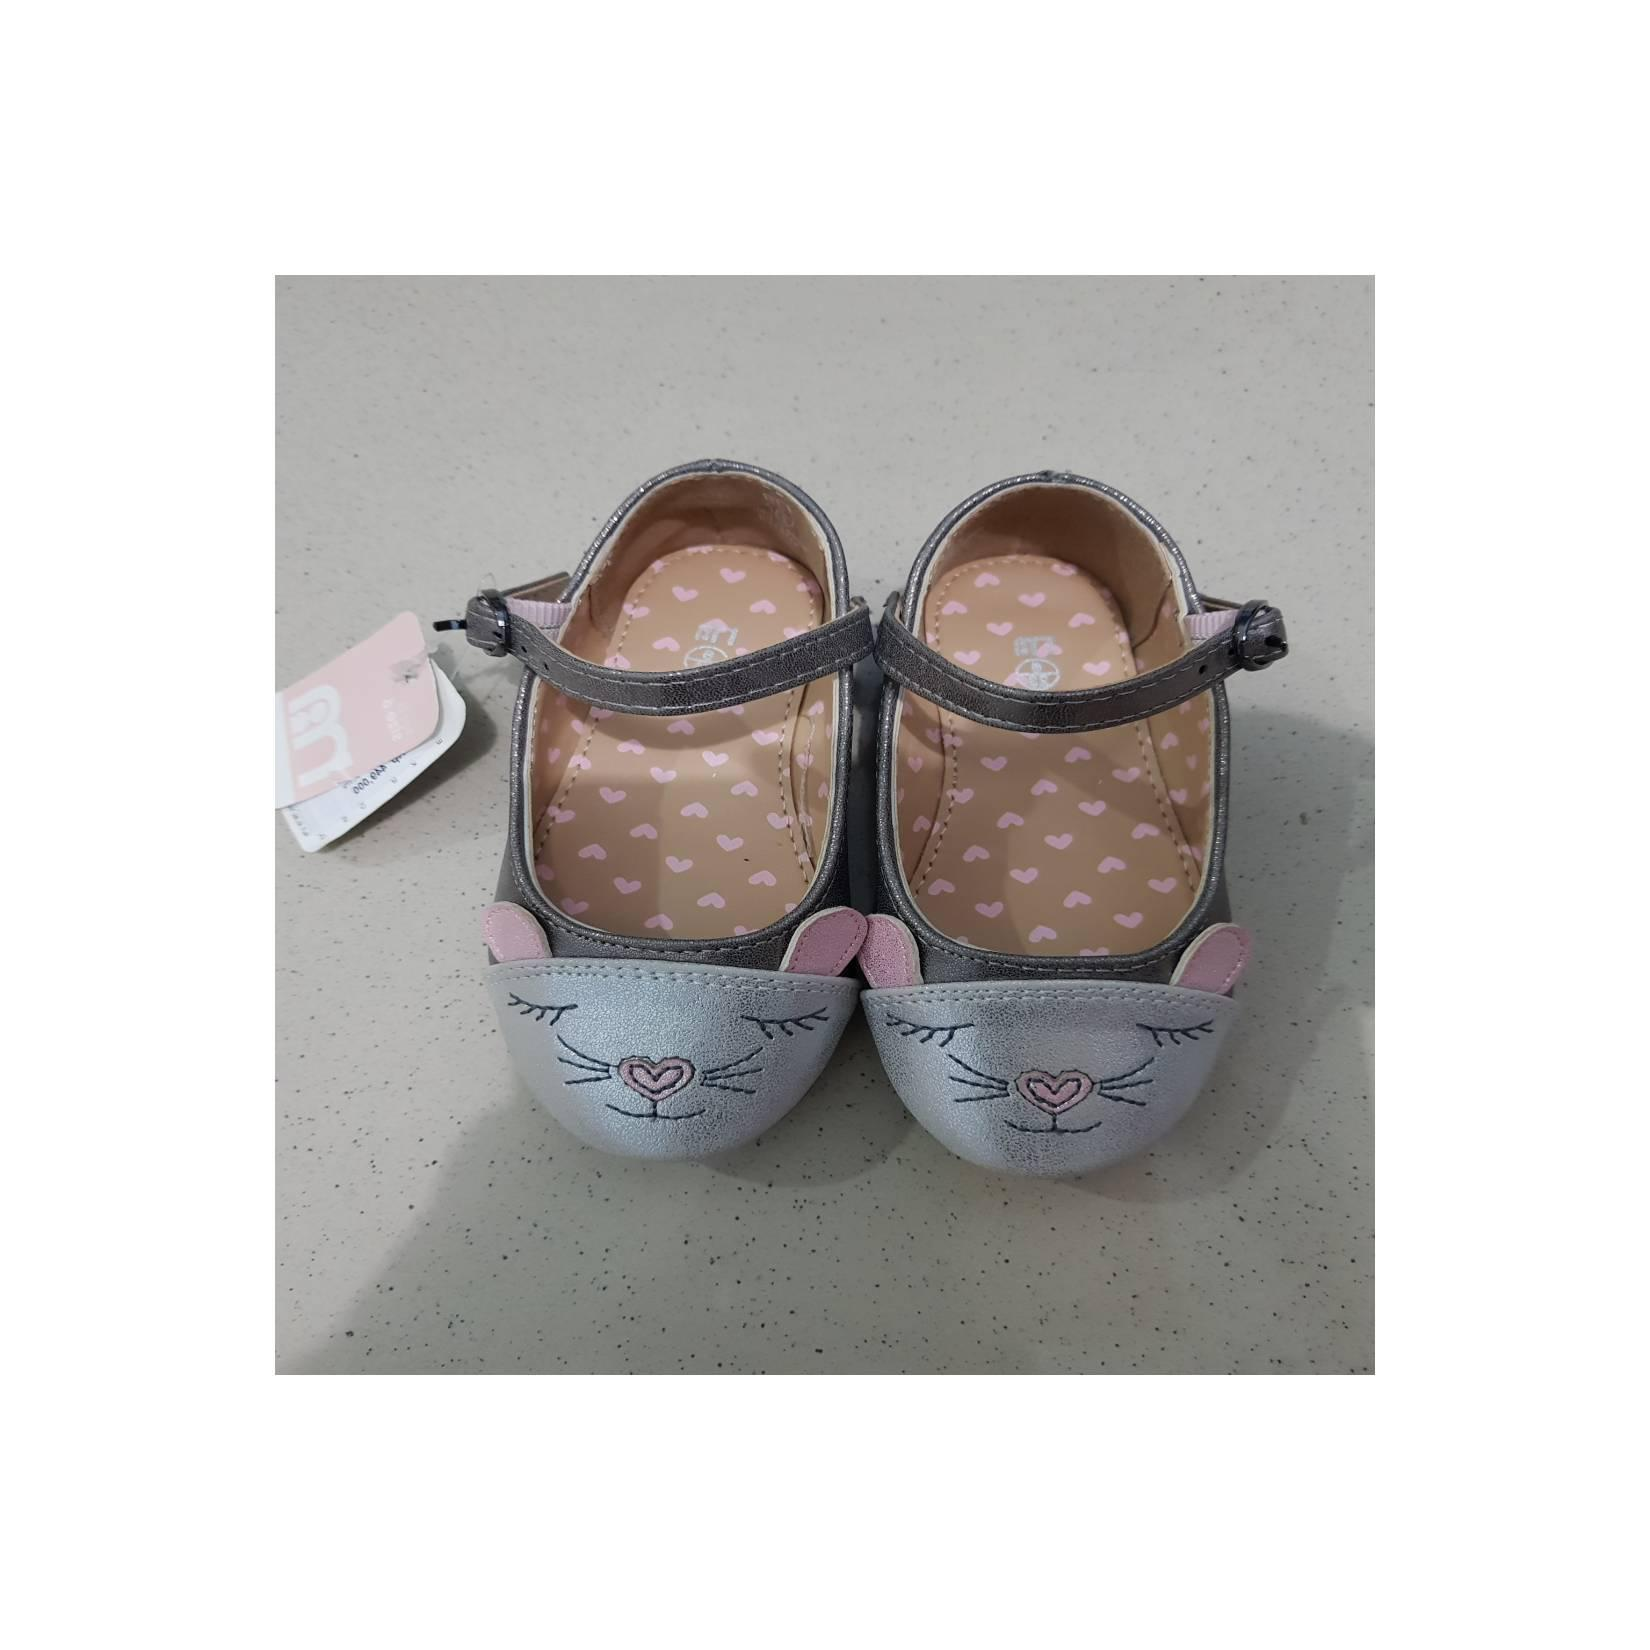 Sepatu mothercare girl cat original size 6